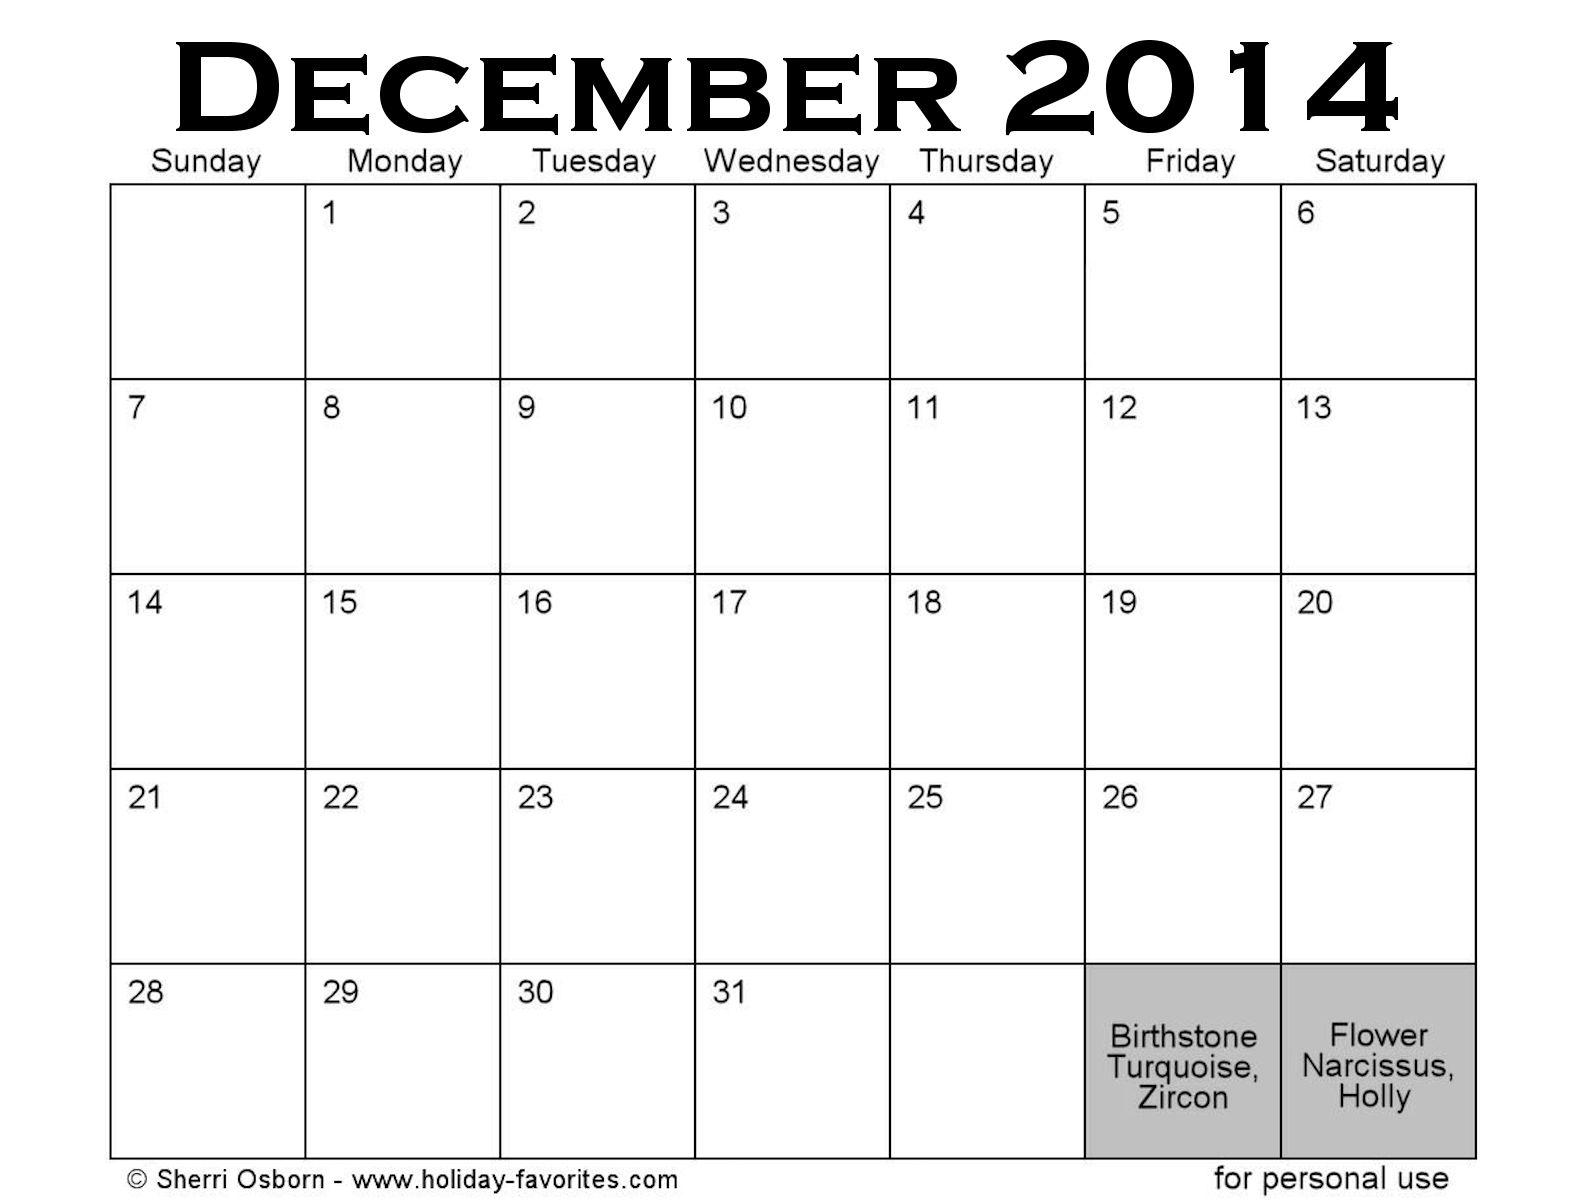 December Holidays | Holiday Favorites